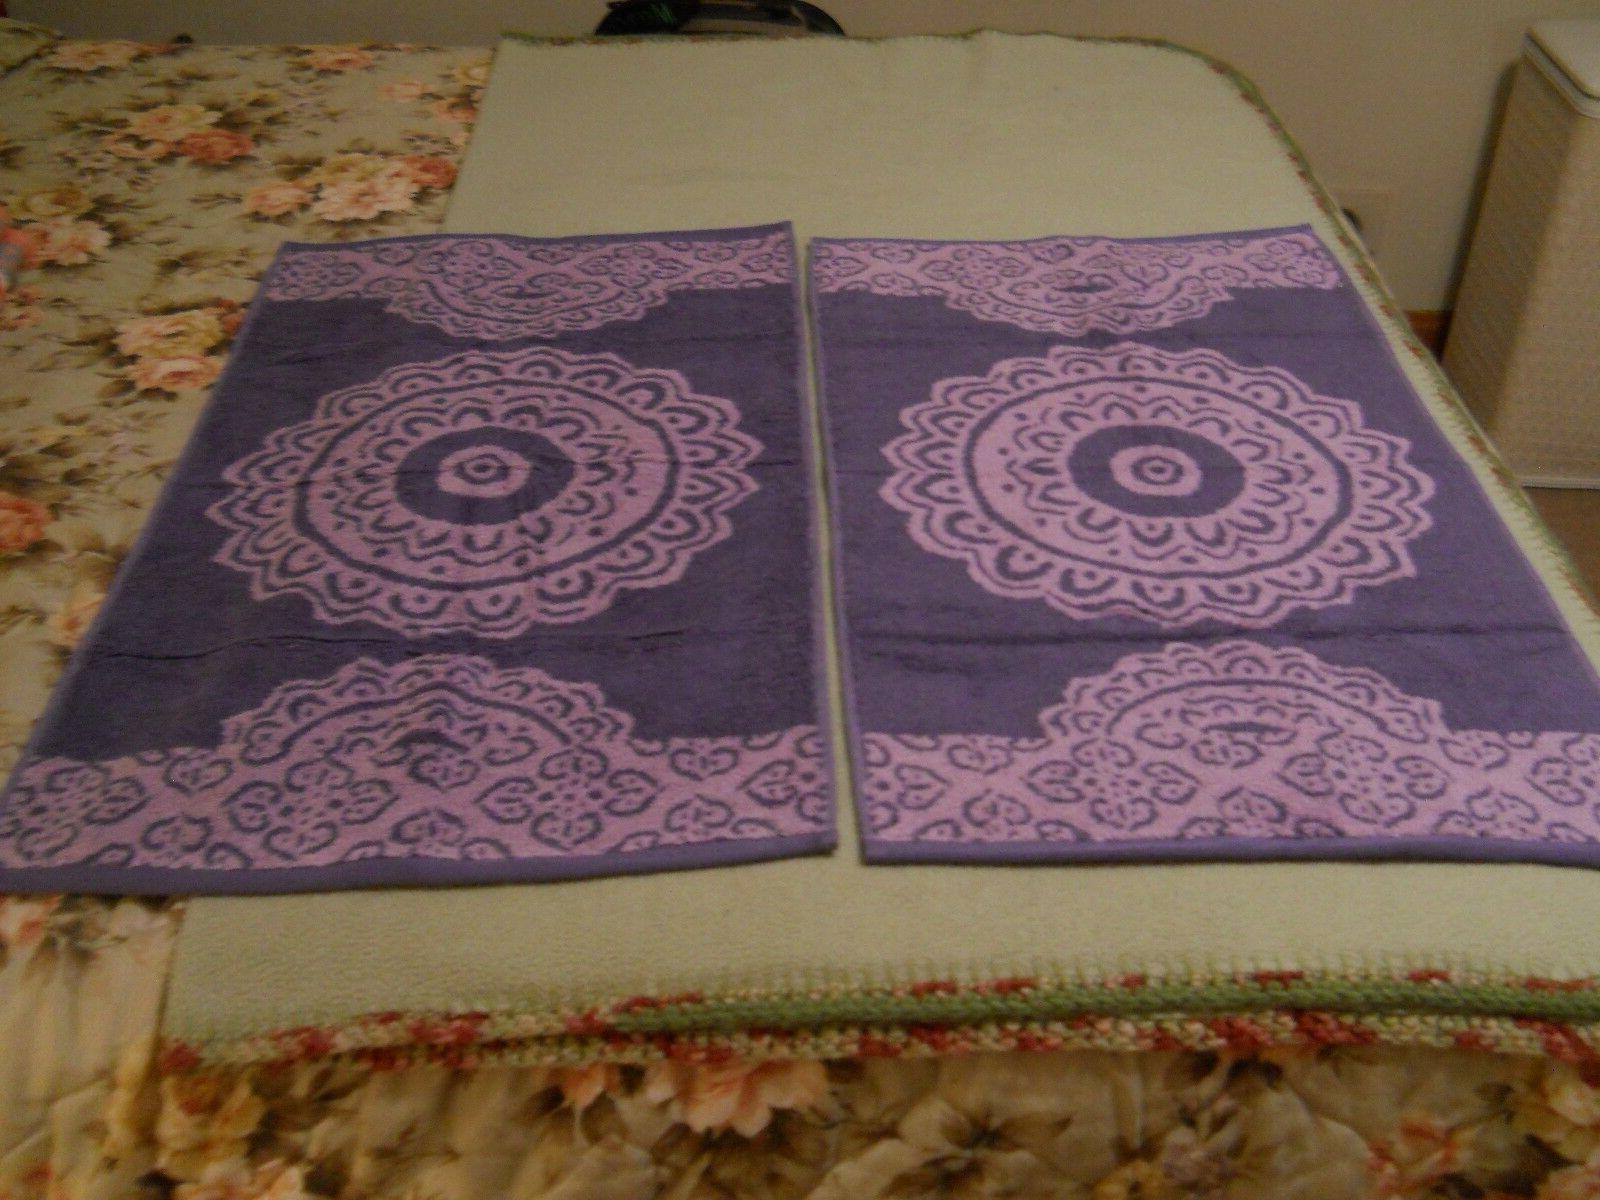 lot of 4 hand towels jacquard design